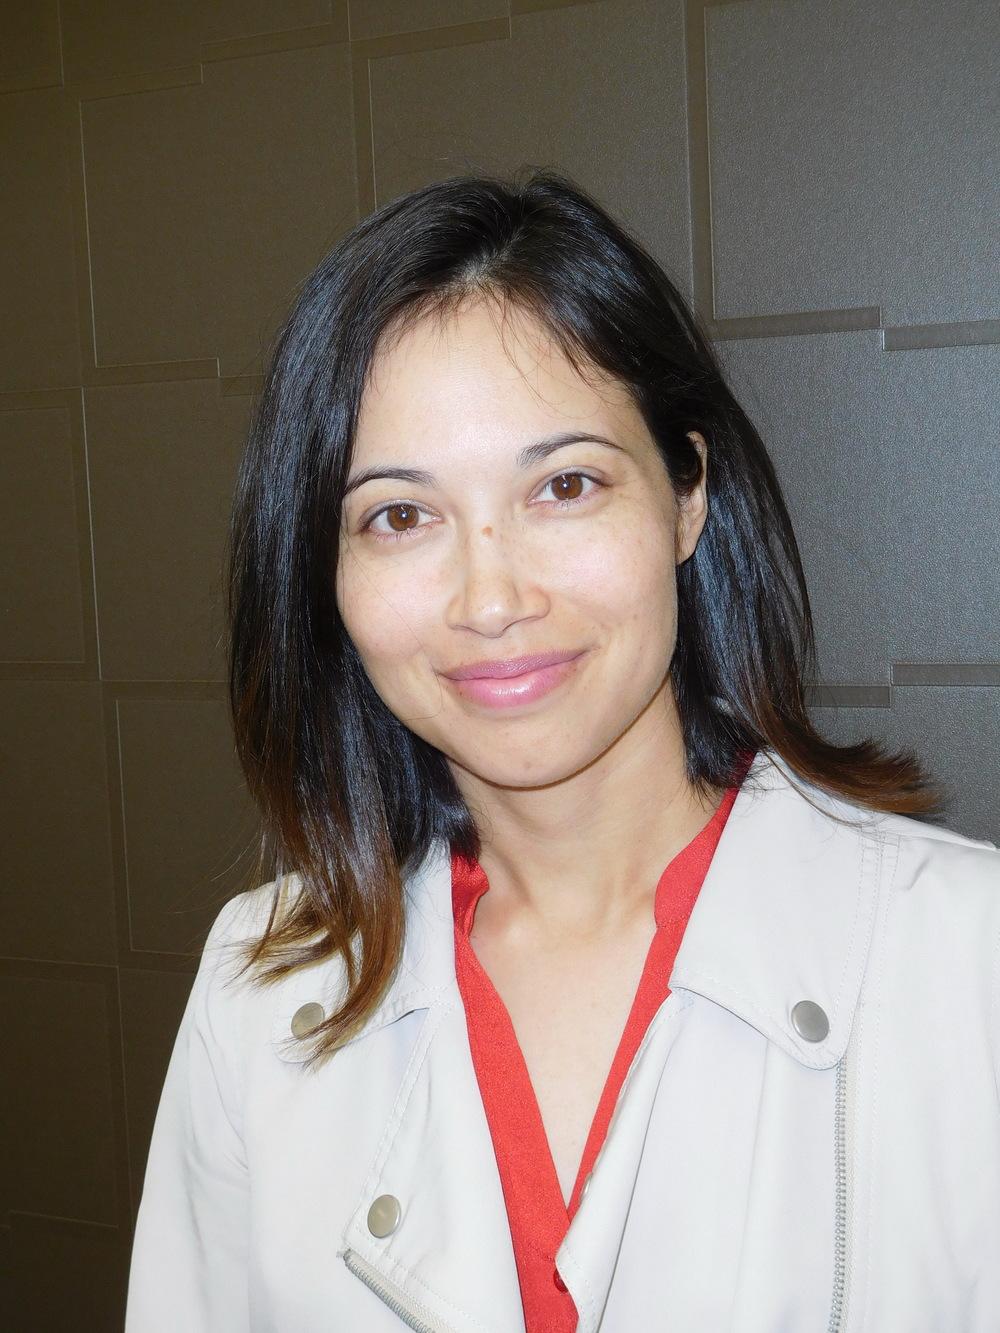 Tara Esser